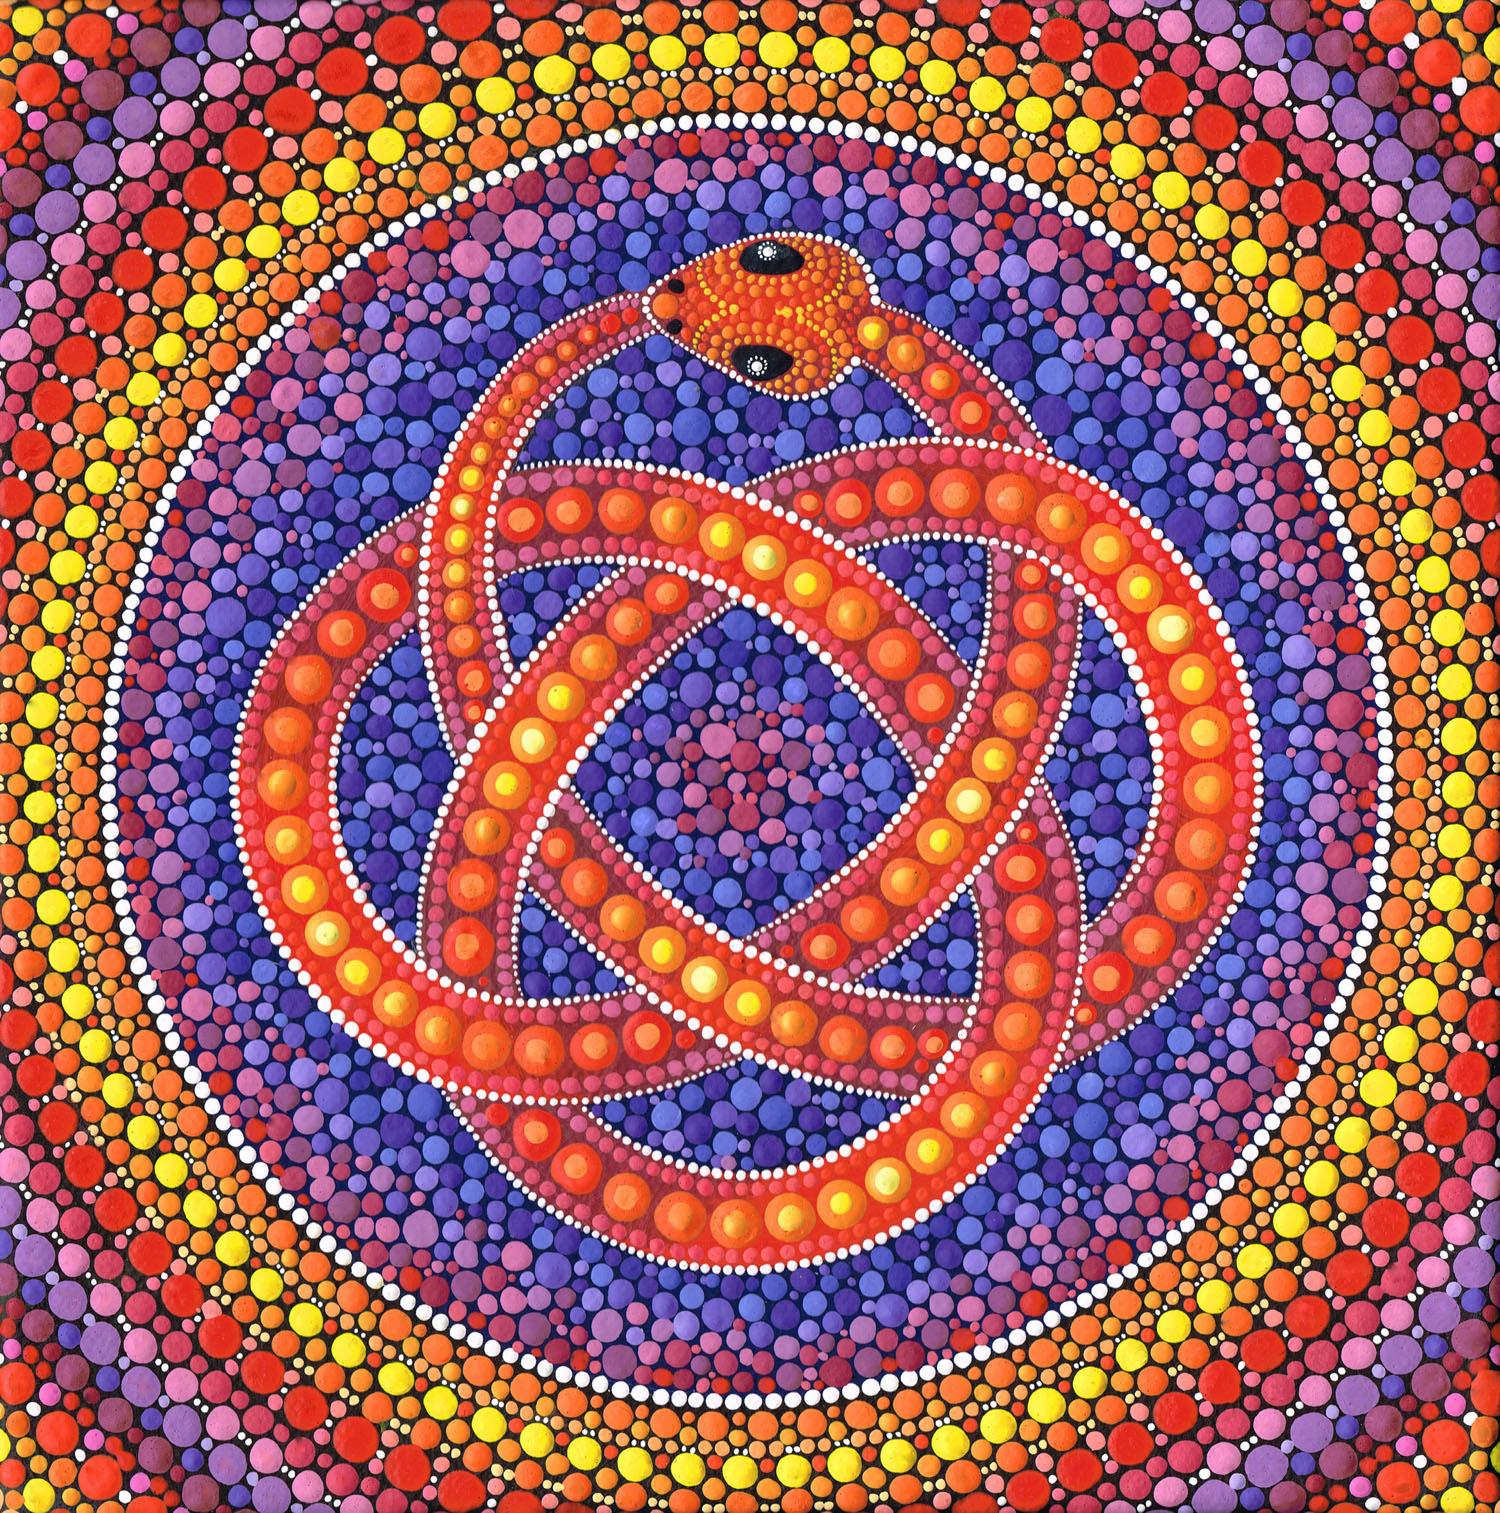 Red Ouroboros Celtic Snake